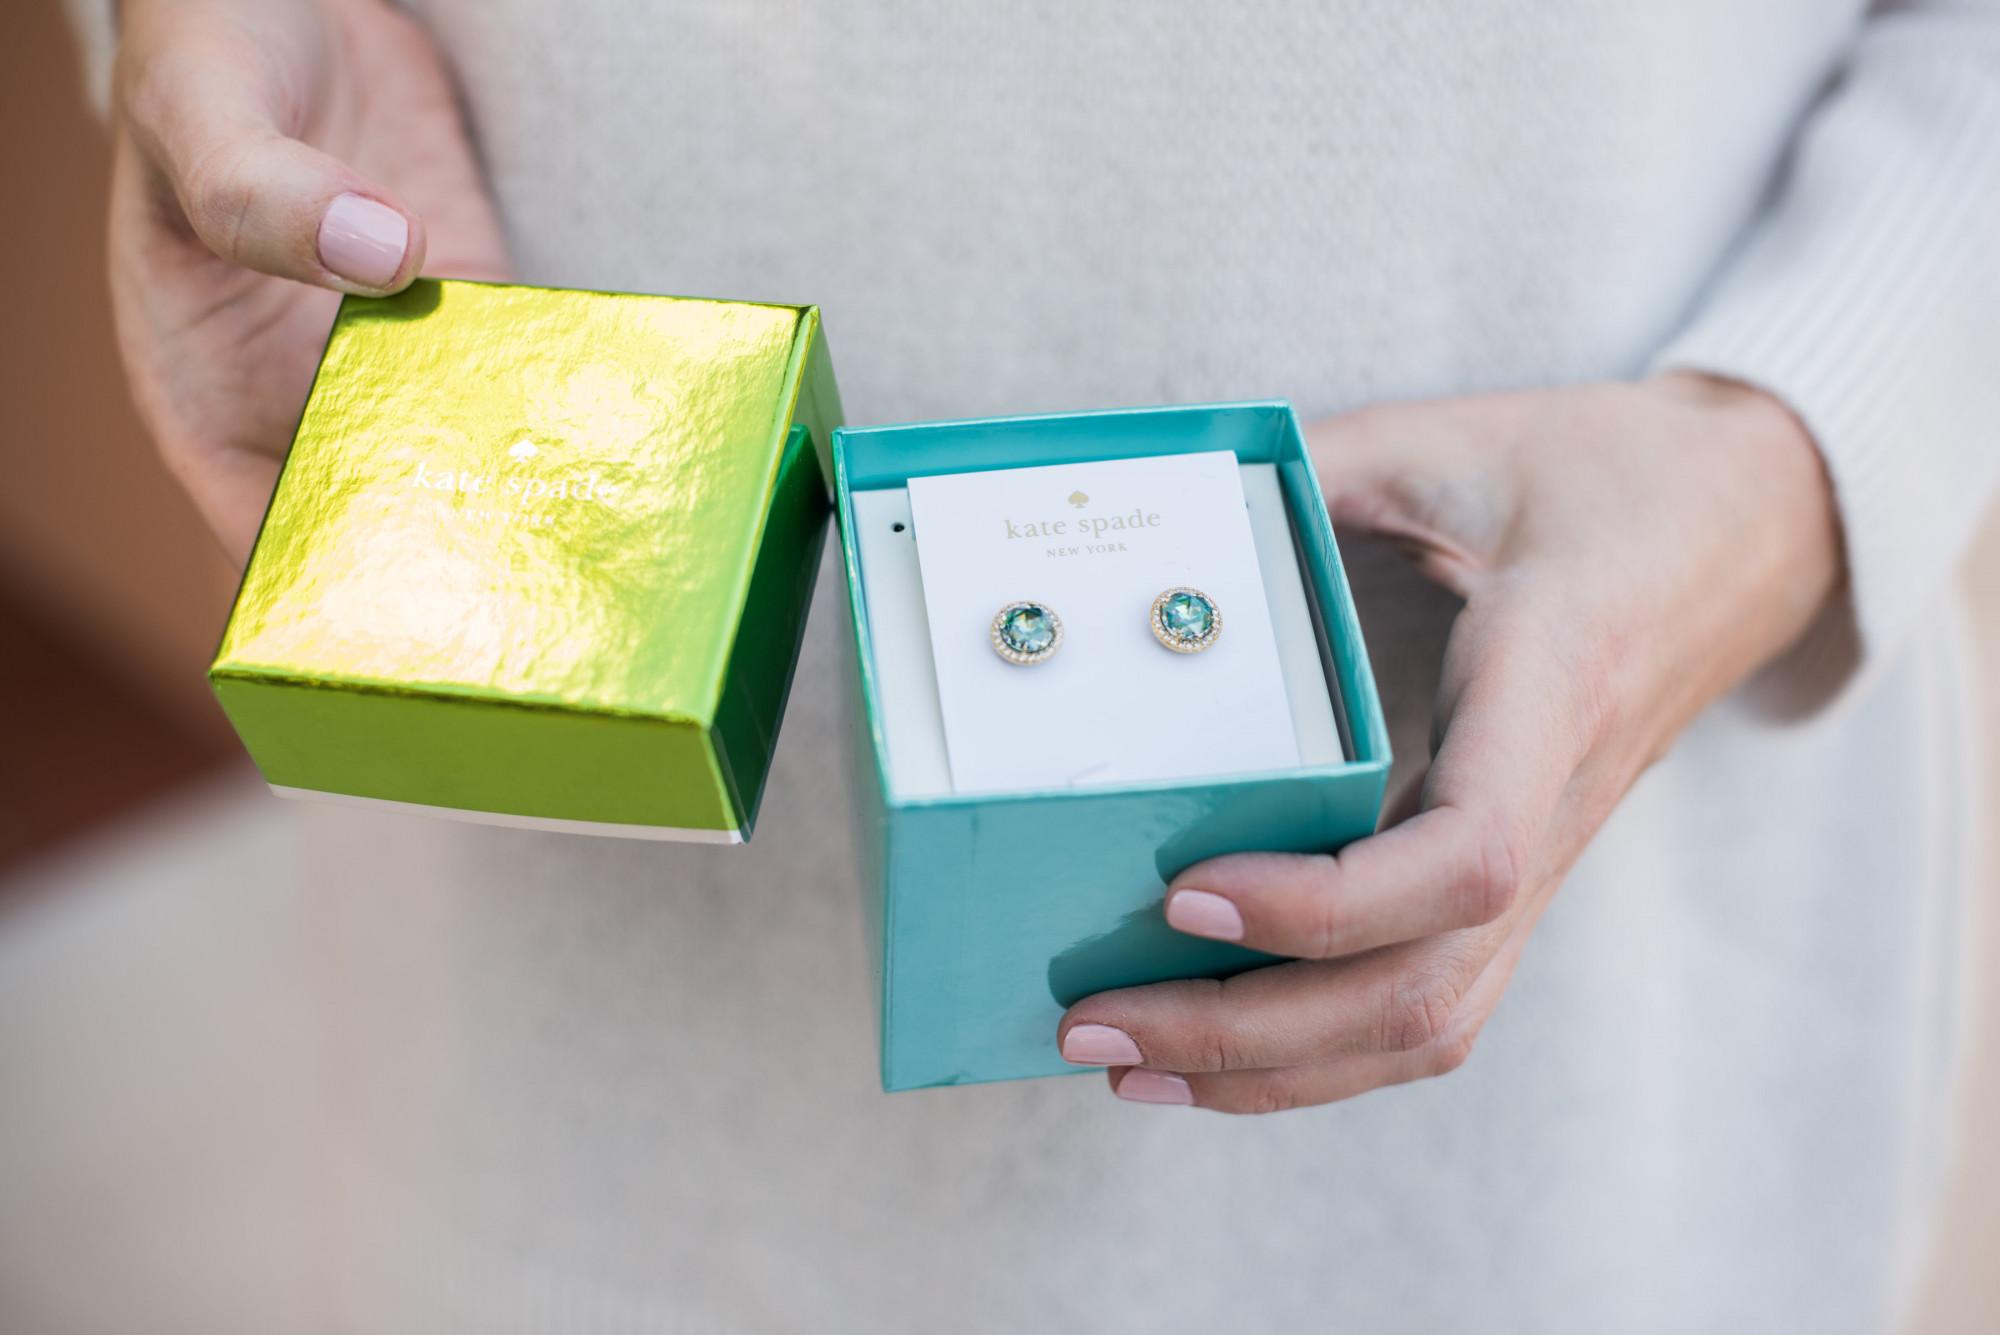 kate spade jewelry gift